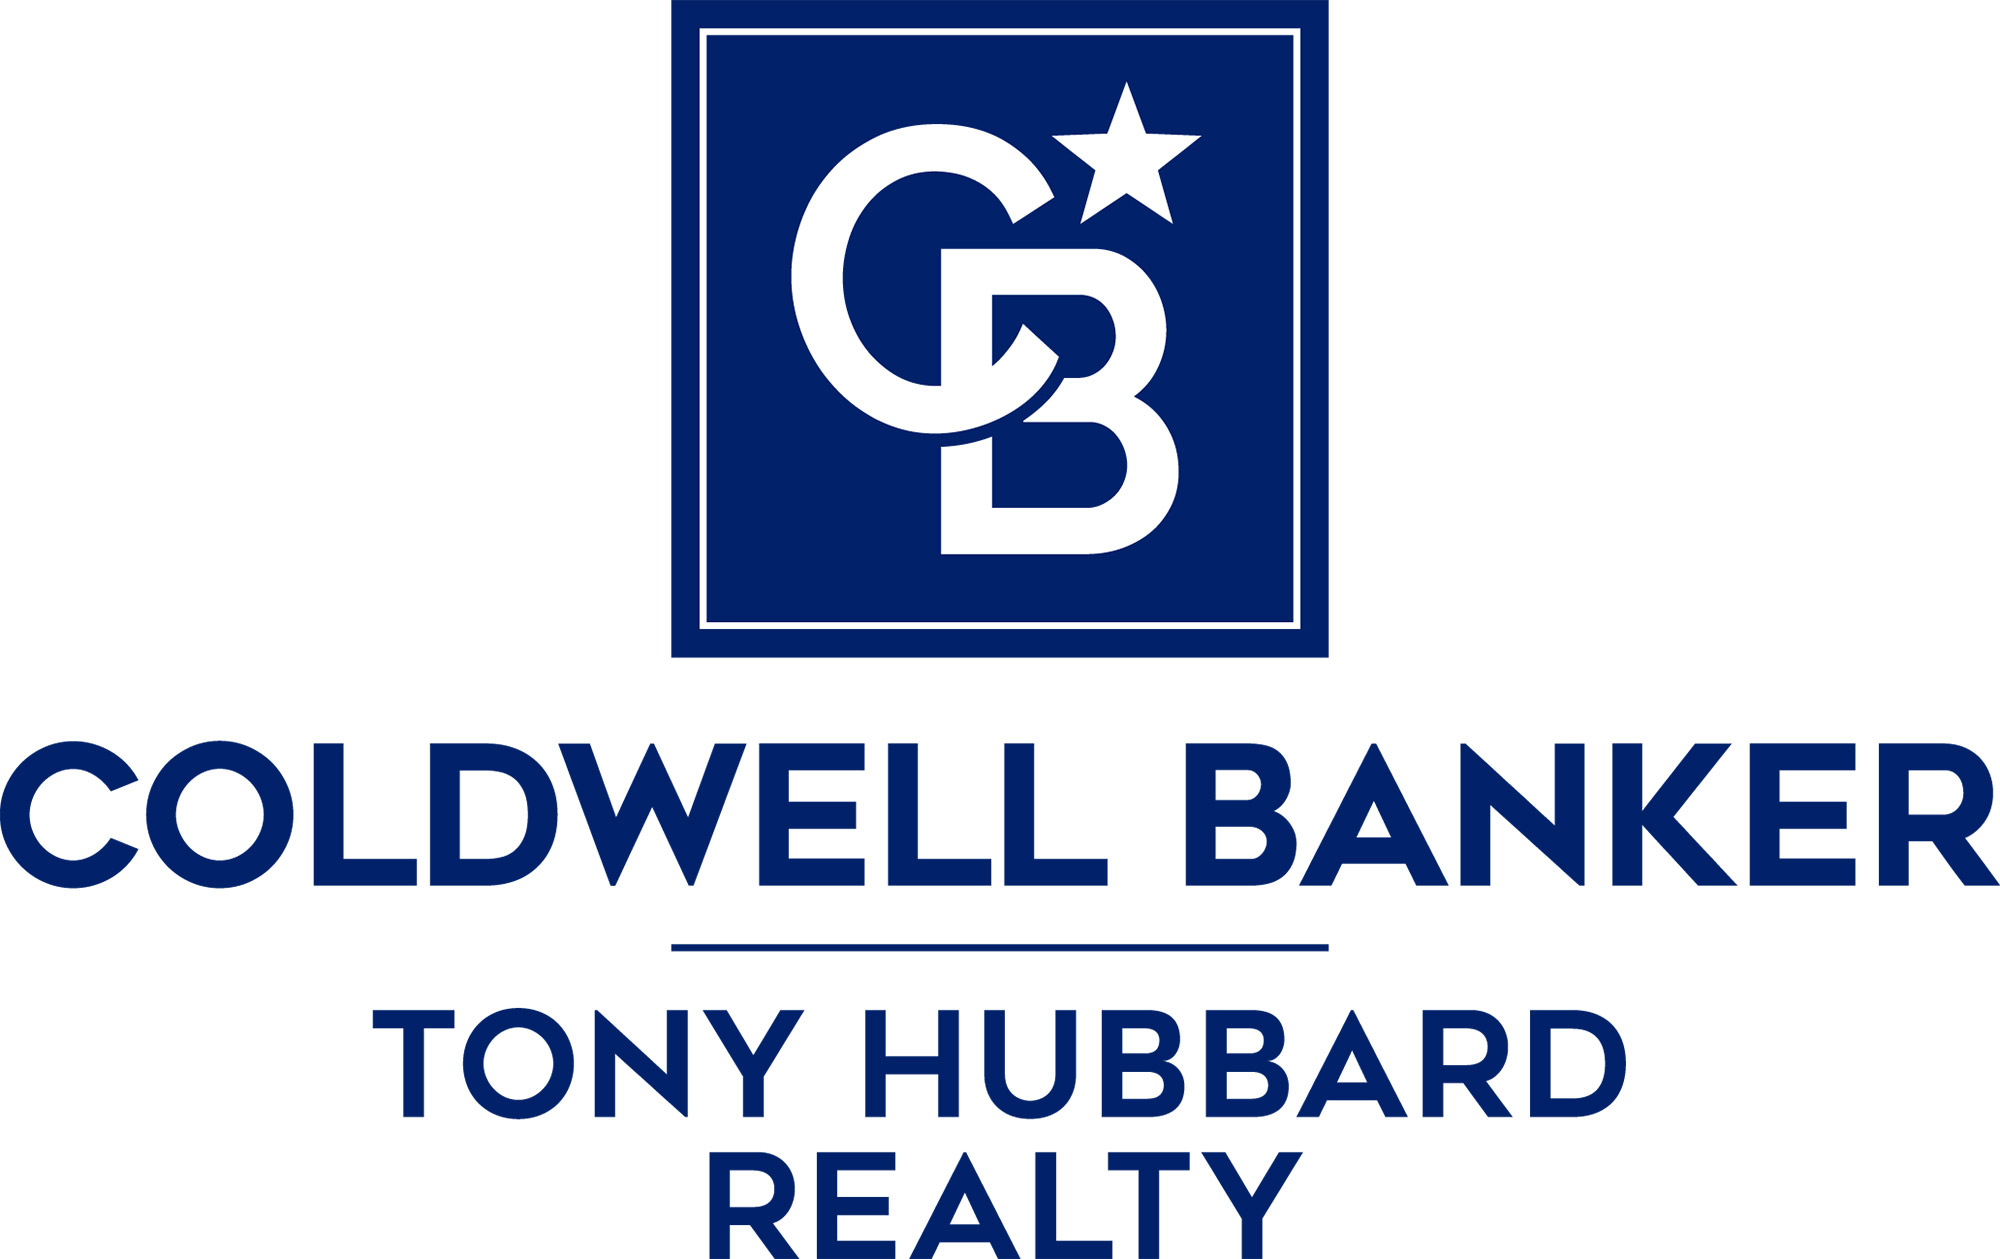 Steve Frericks - Coldwell Banker Tony Hubbard Logo